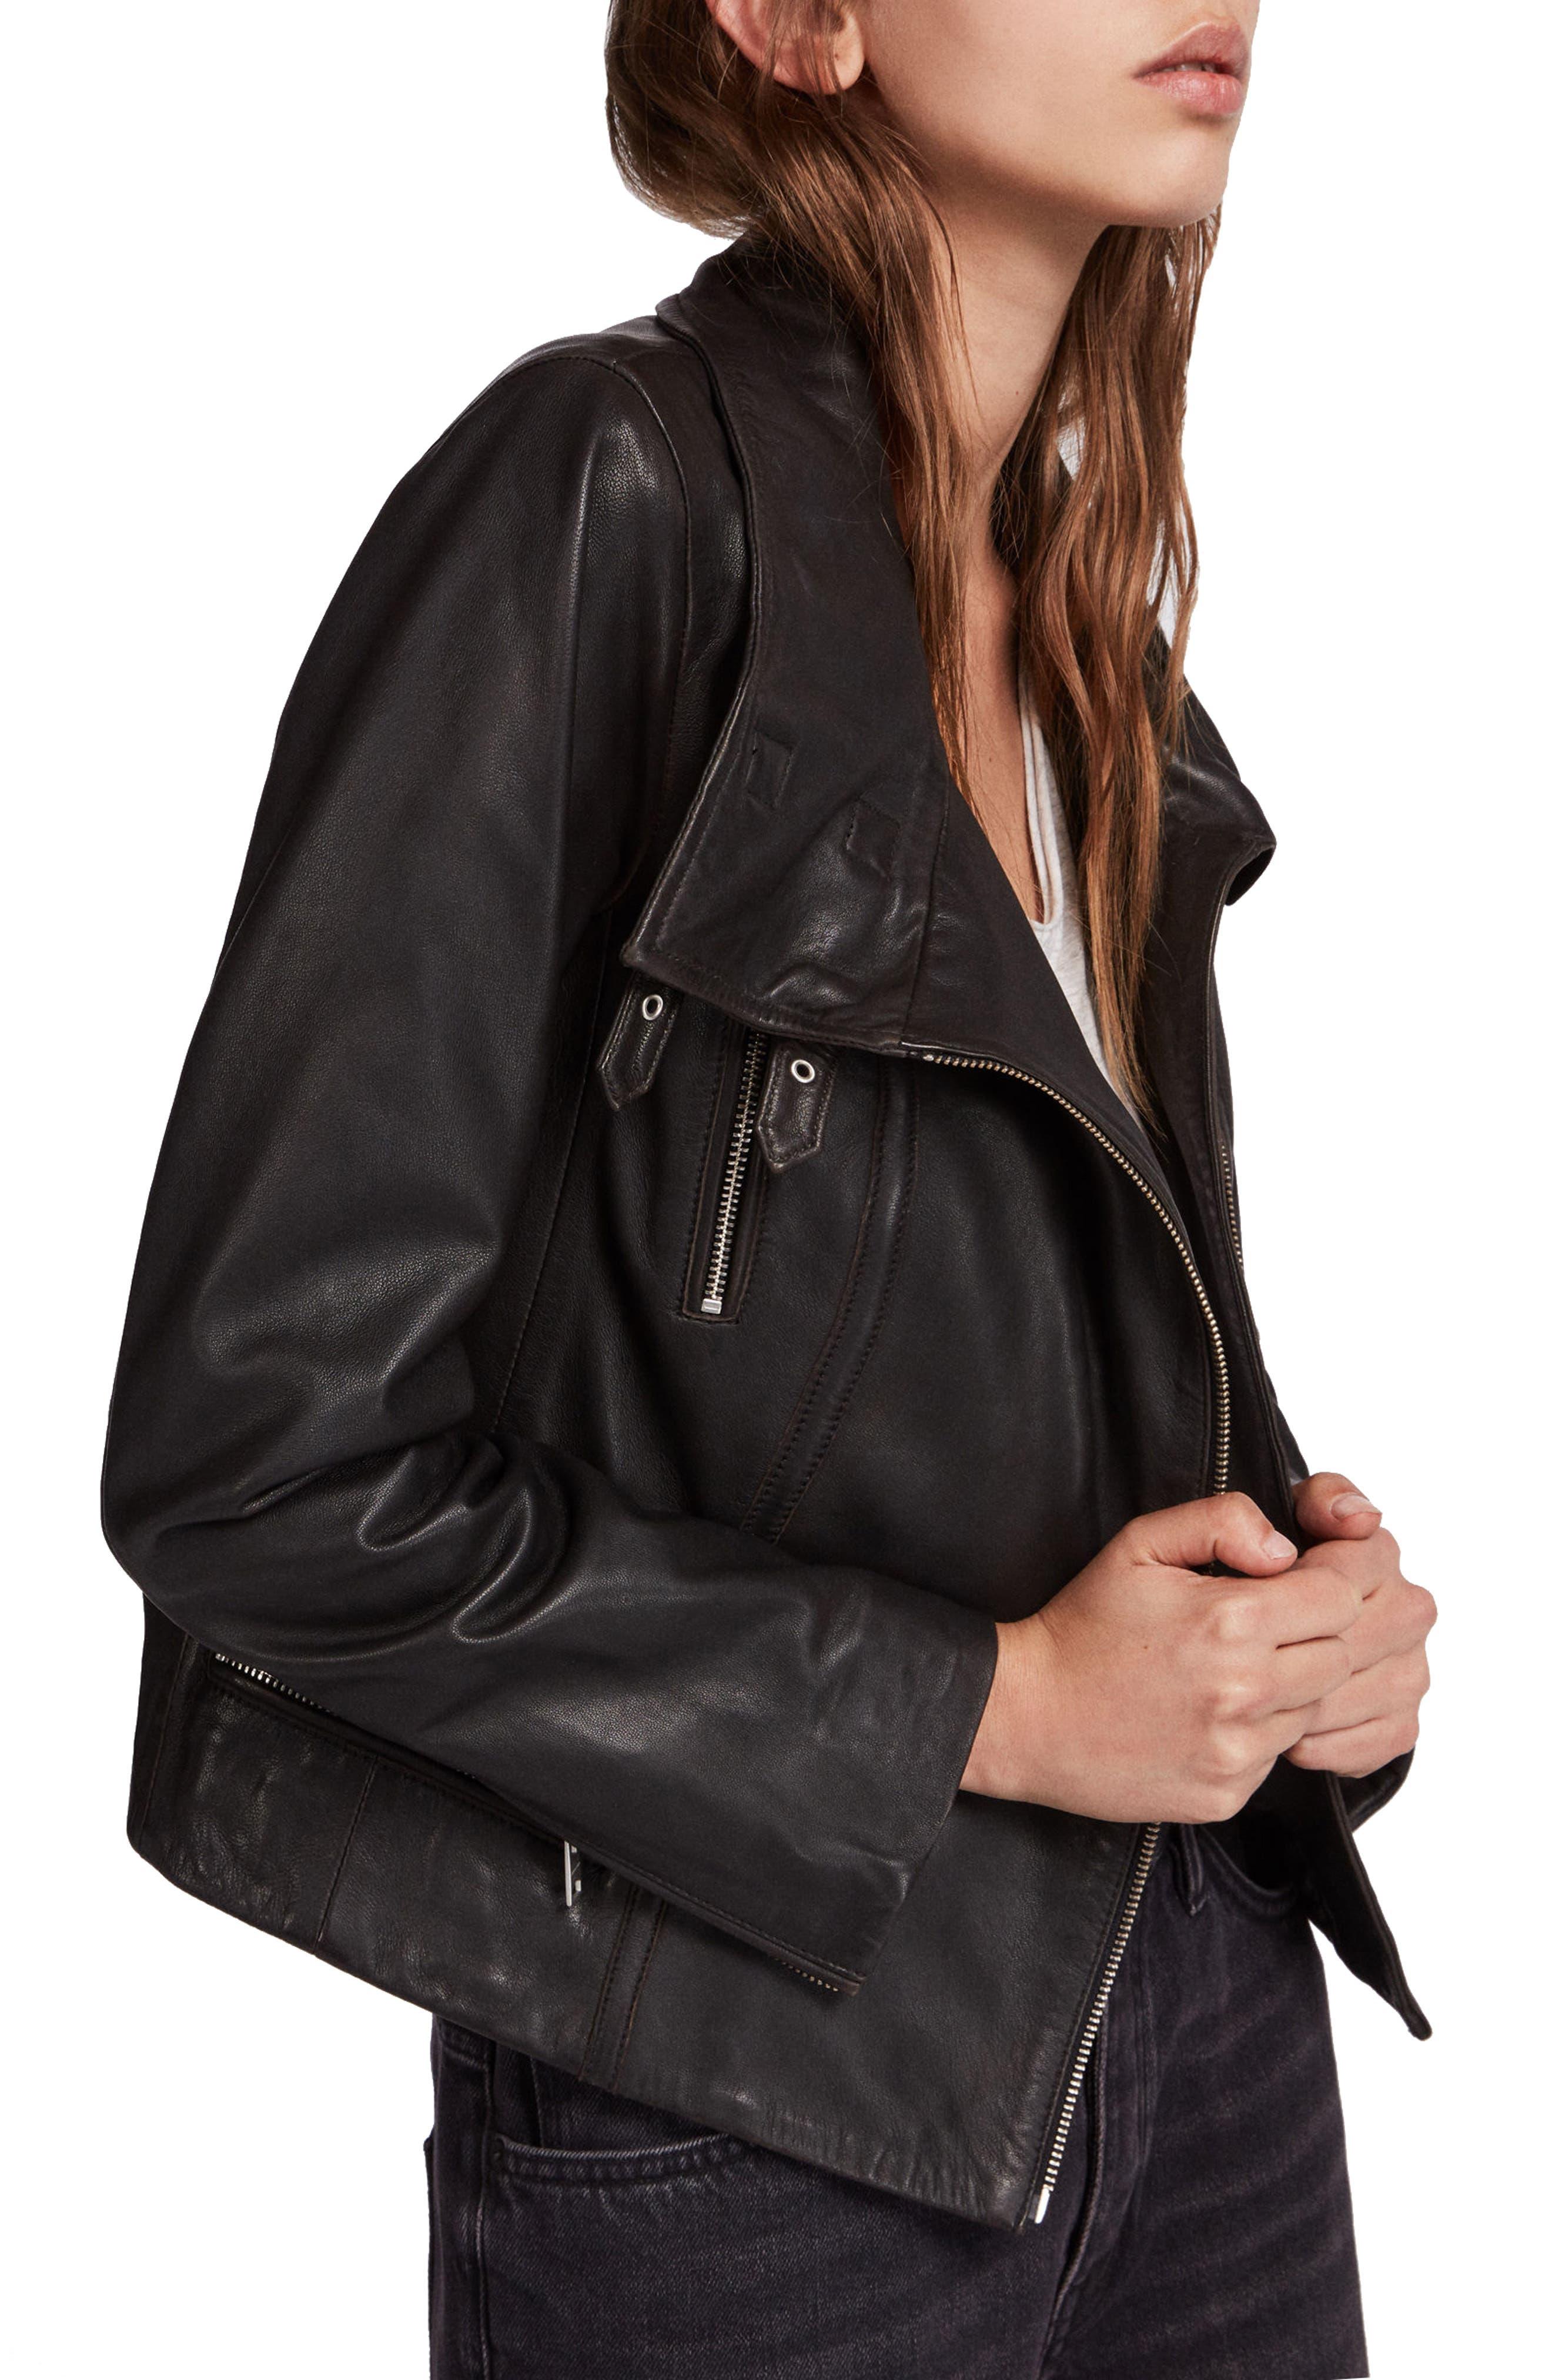 ALLSAINTS, Bales Leather Biker Jacket, Alternate thumbnail 3, color, BLACK